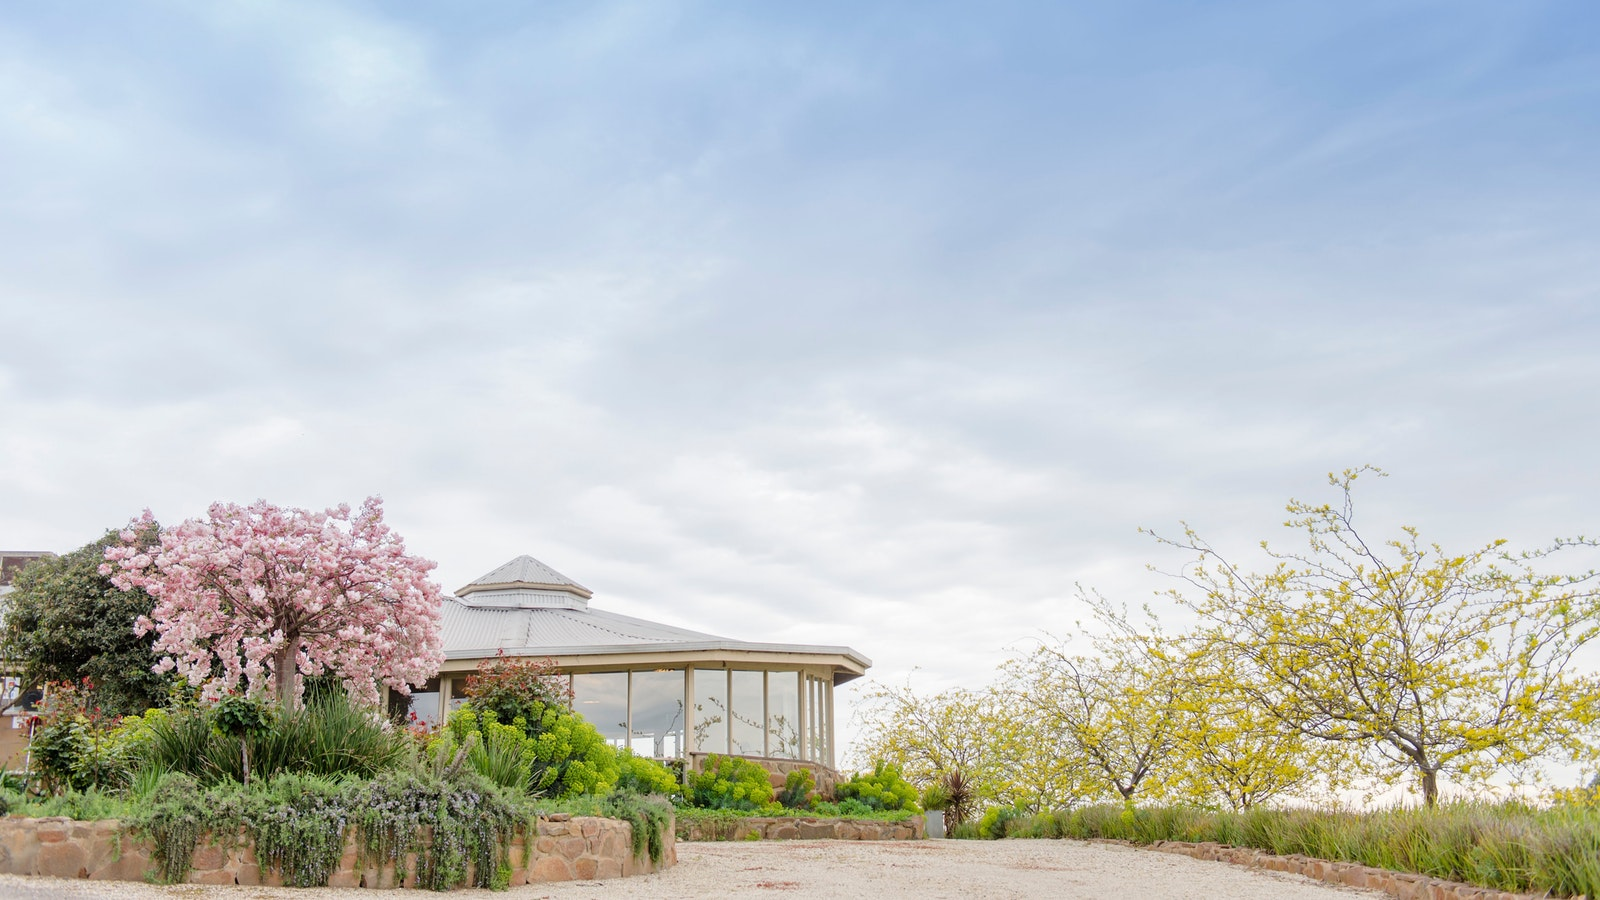 Spring in the Strathbogie Ranges - Fowles Wine Cellar Door Cafe